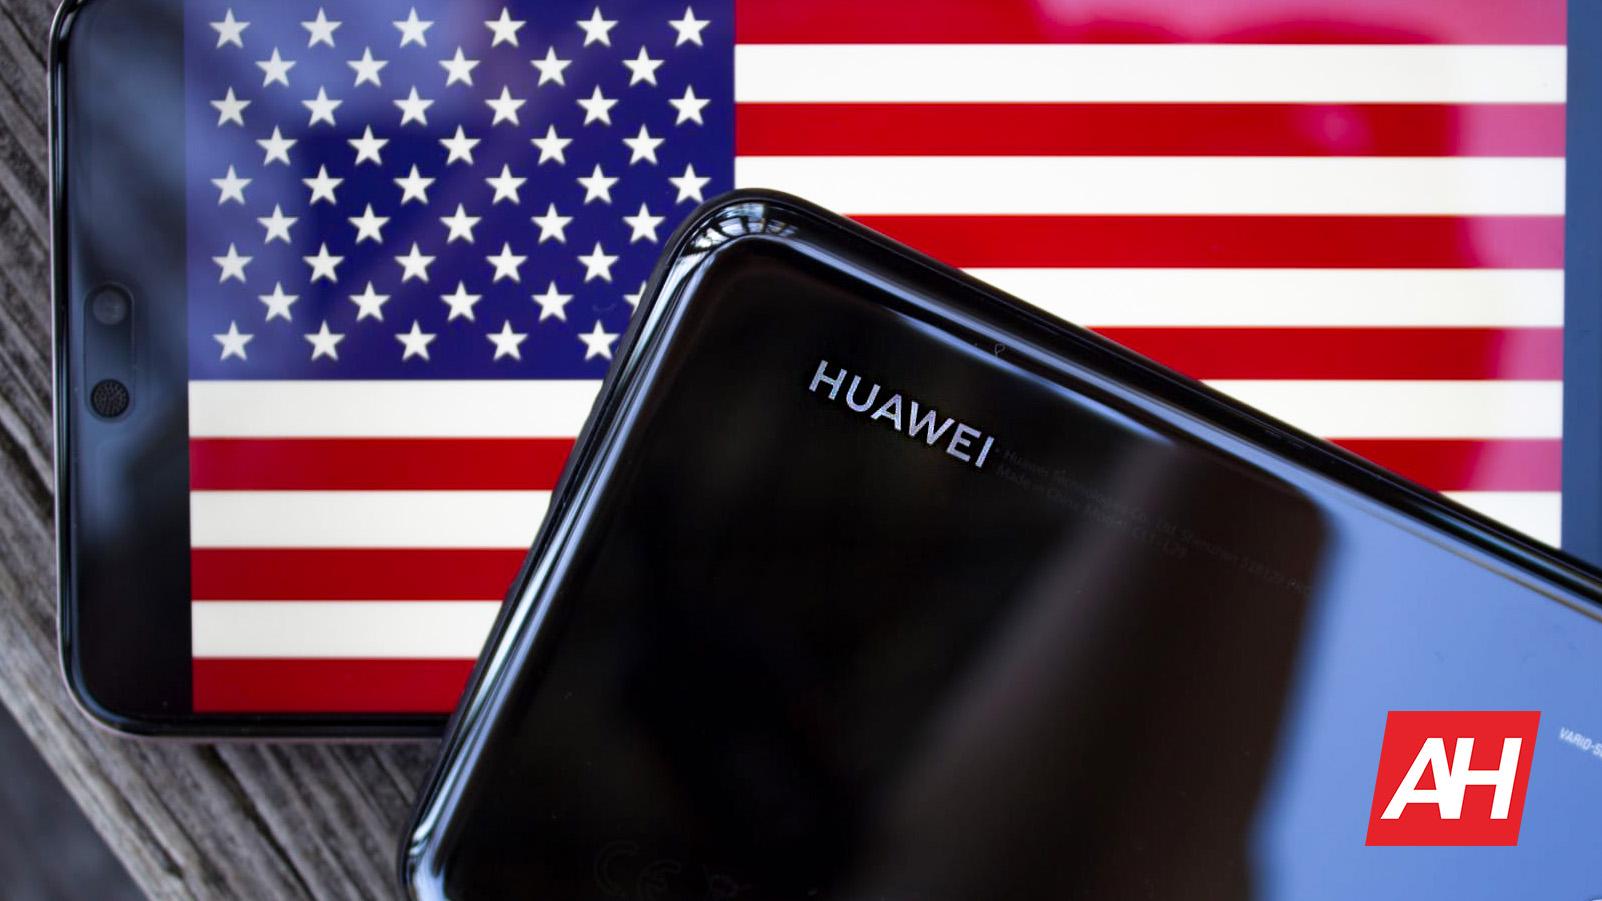 Huawei Chairman Casts Doubt On U.S. 5G Plan